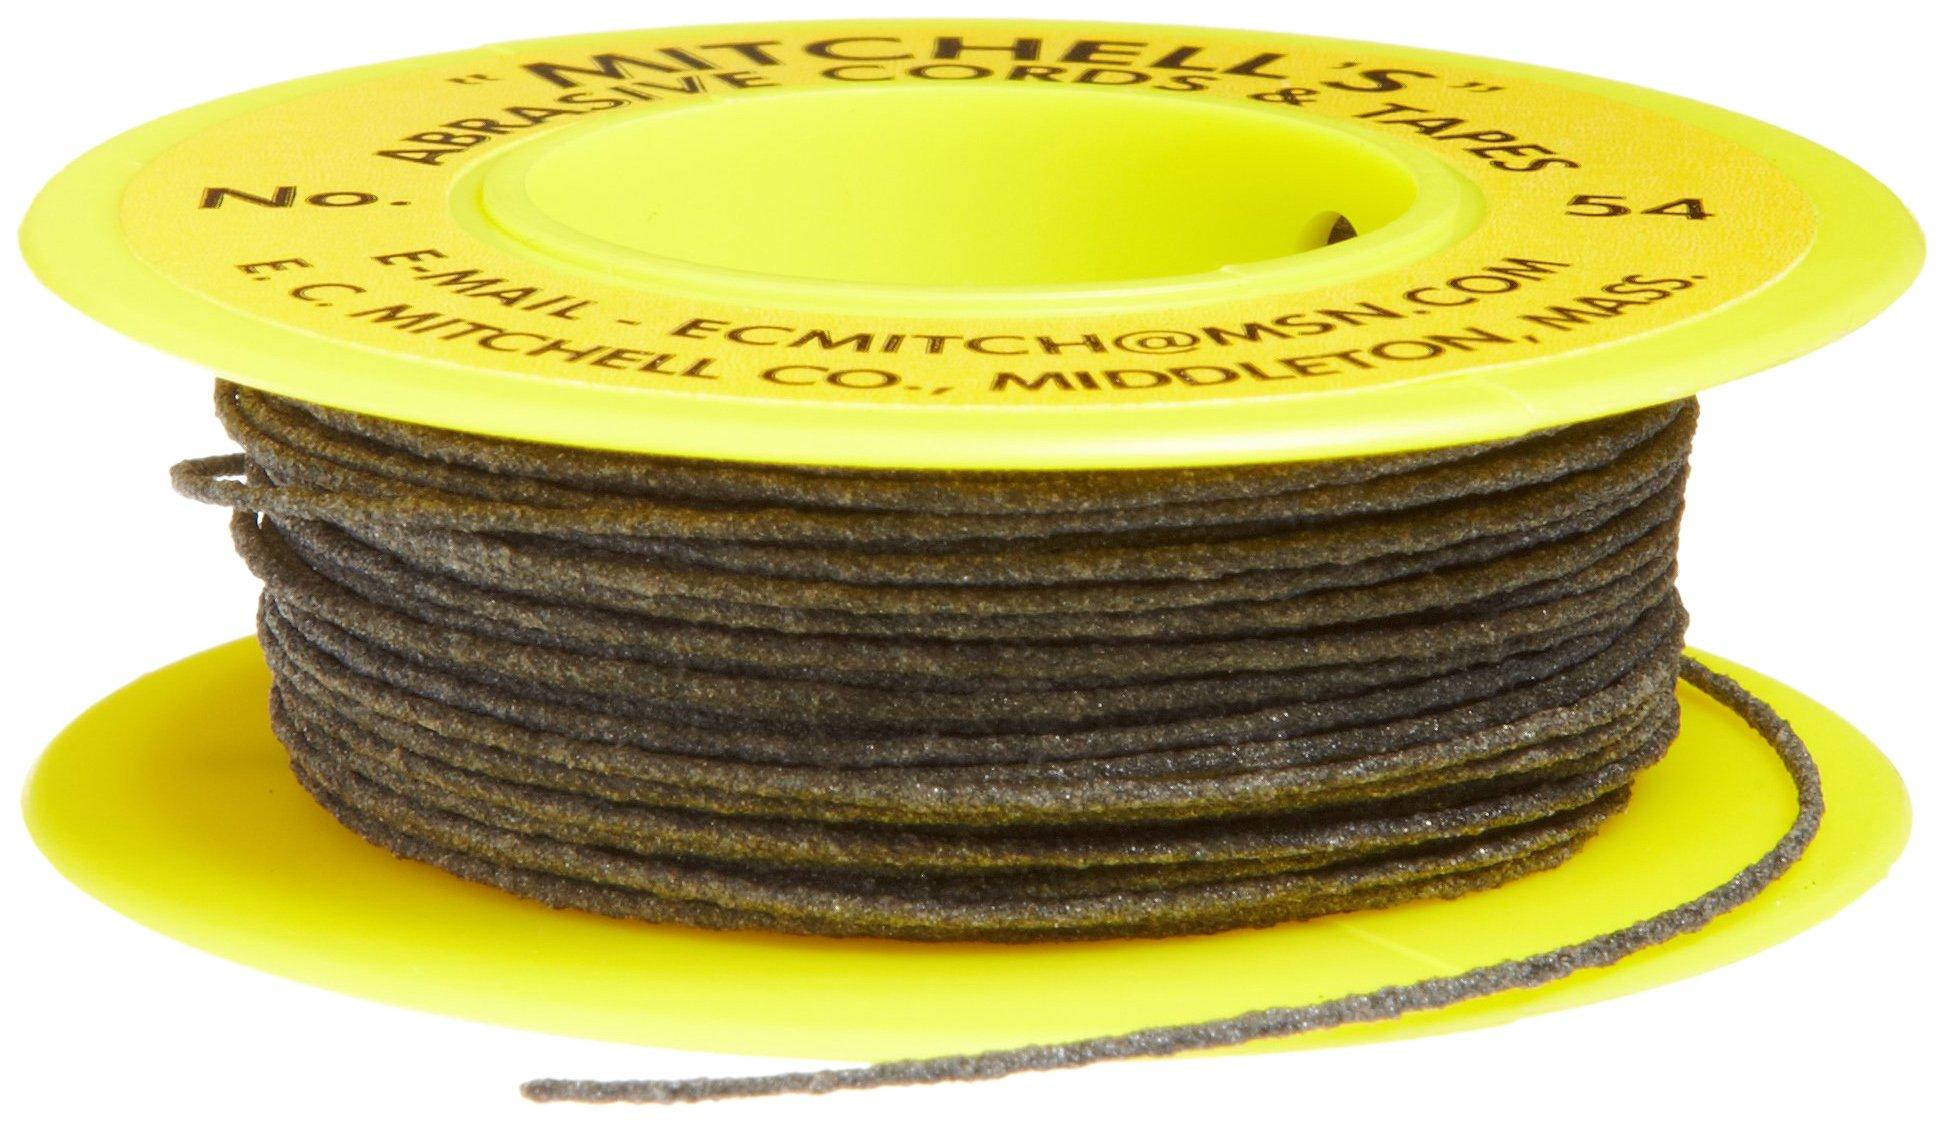 Mitchell Abrasives 54-S Round Abrasive Cord, Silicon Carbide 180 Grit .030'' Diameter x 25 Feet by Mitchell Abrasives